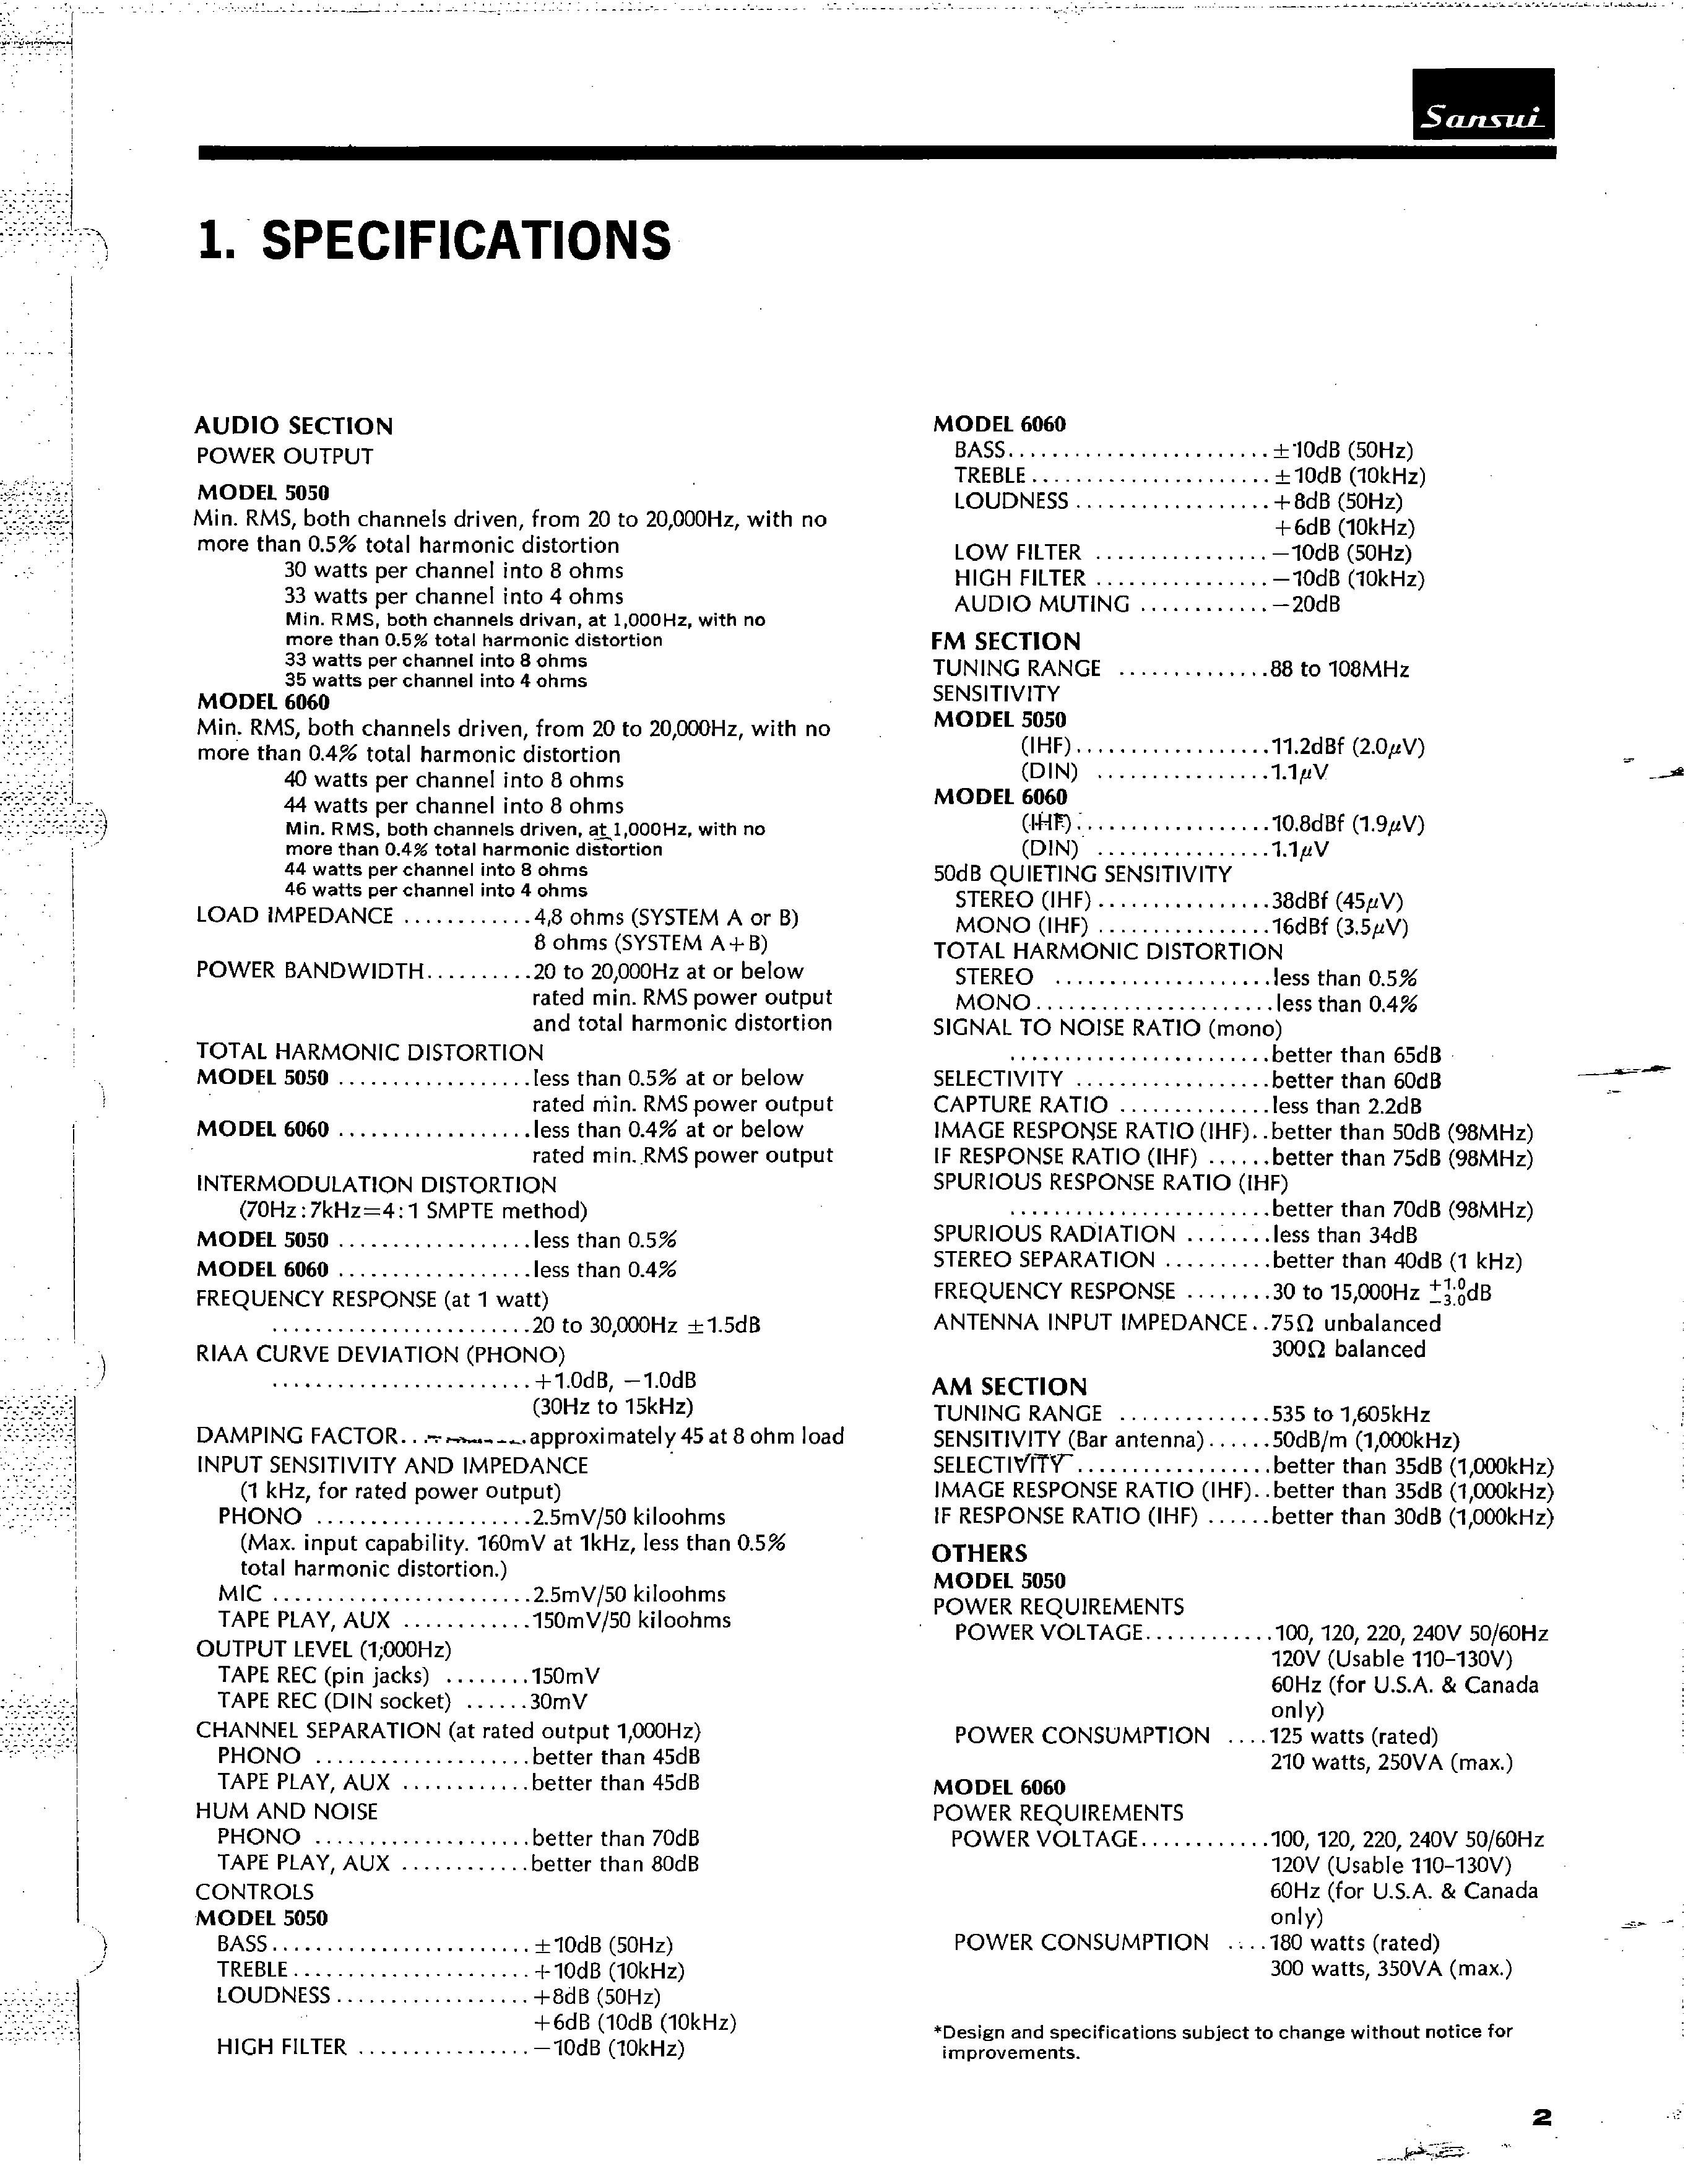 service manual for sansui 6060